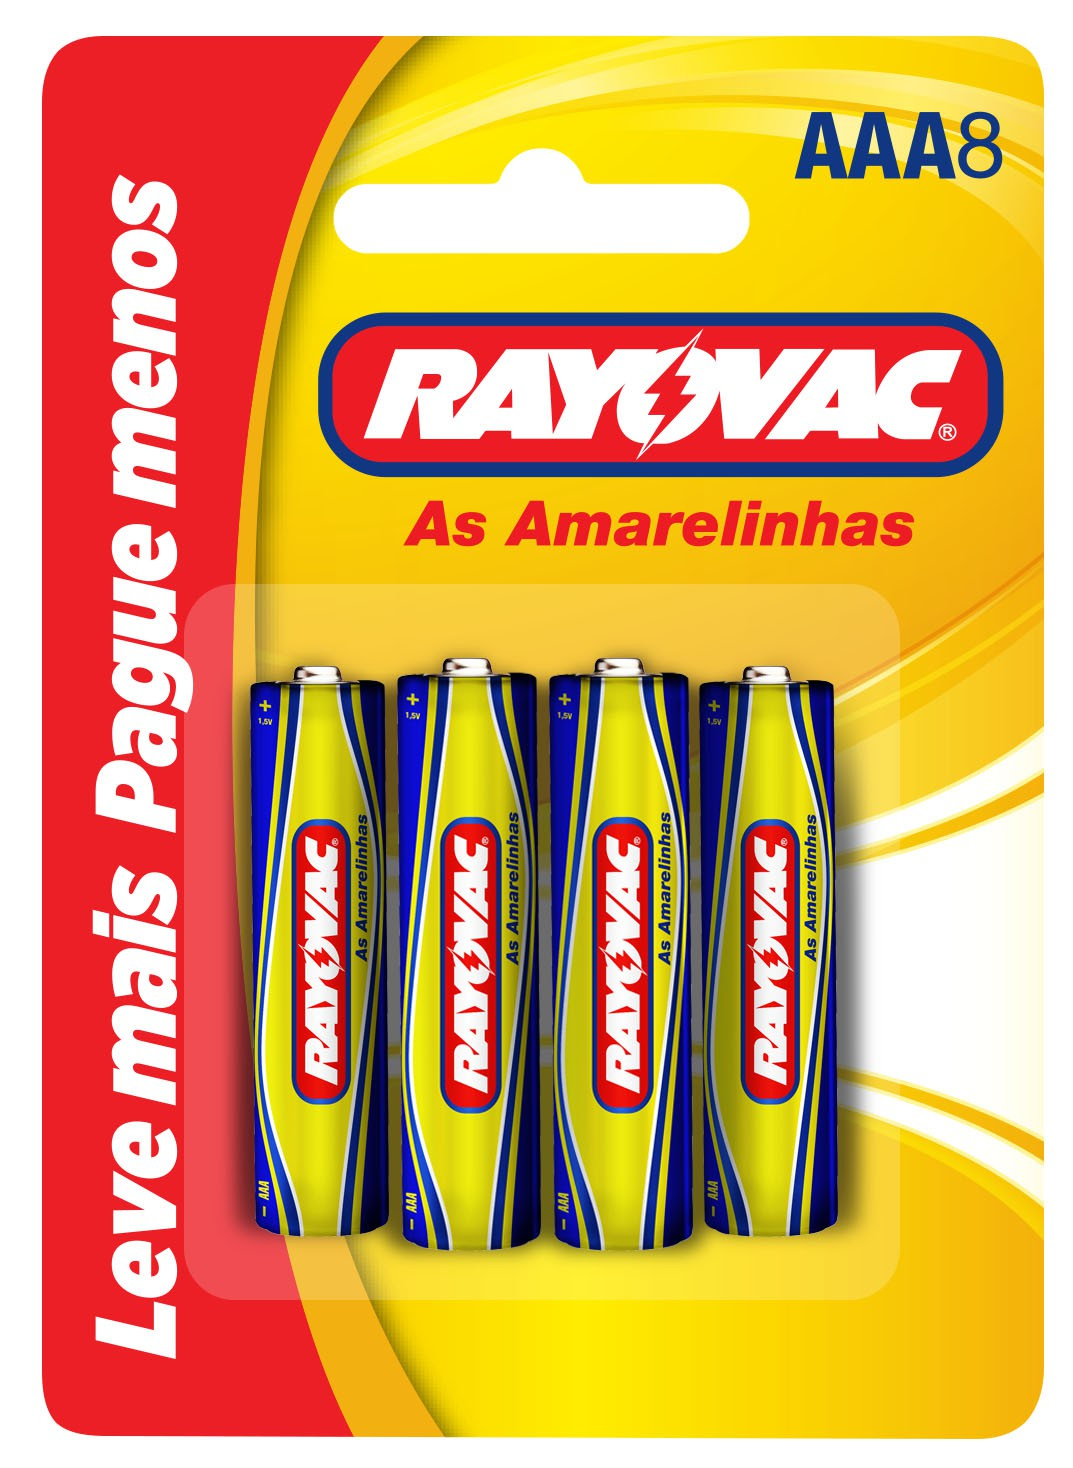 16 Pilhas AAA Zinco Carvão RAYOVAC 2 cartelas